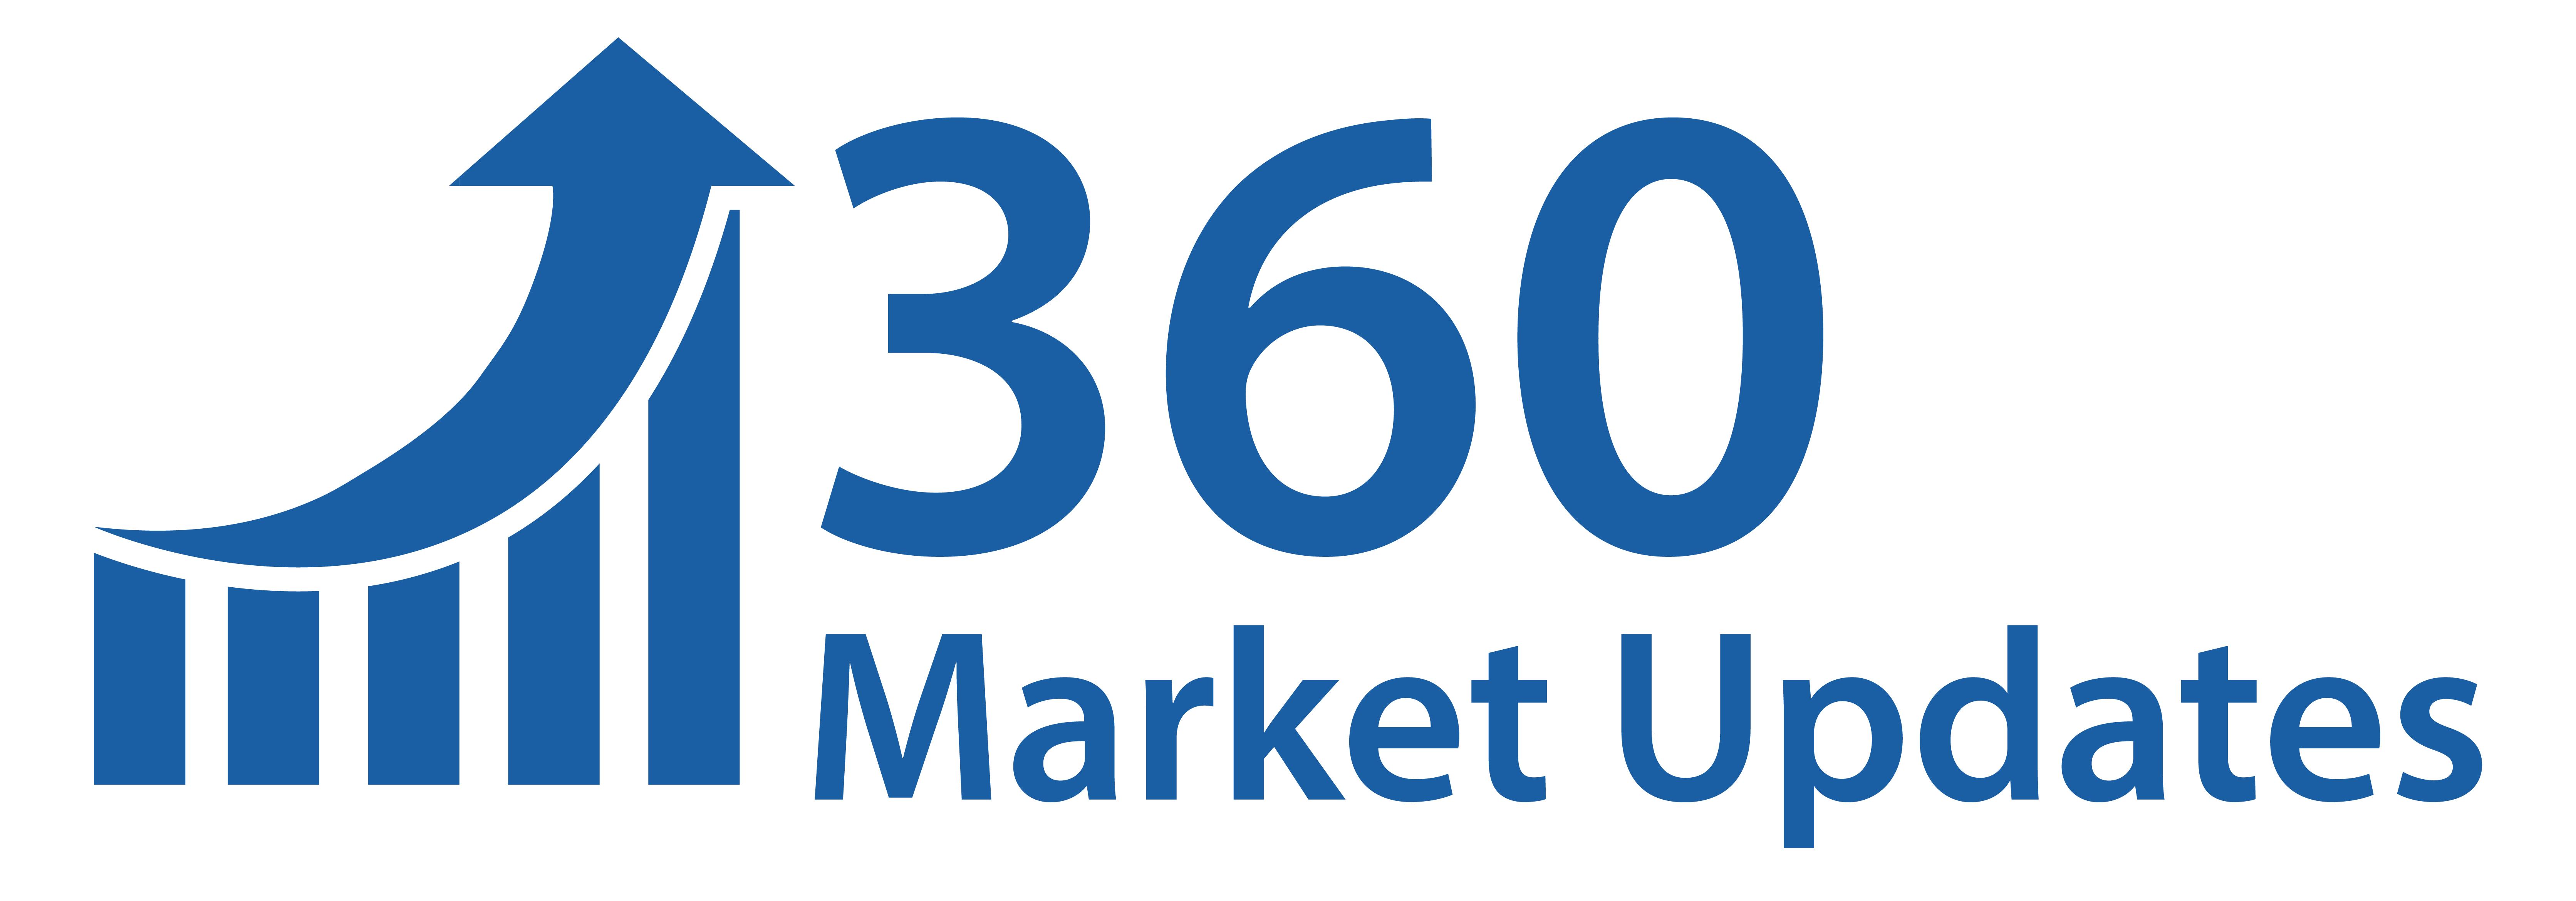 Carbocisteine Market Outlook 2020: Market Trends, Segmentation, consumption by Regional data, Market Growth and Competitive Landscape